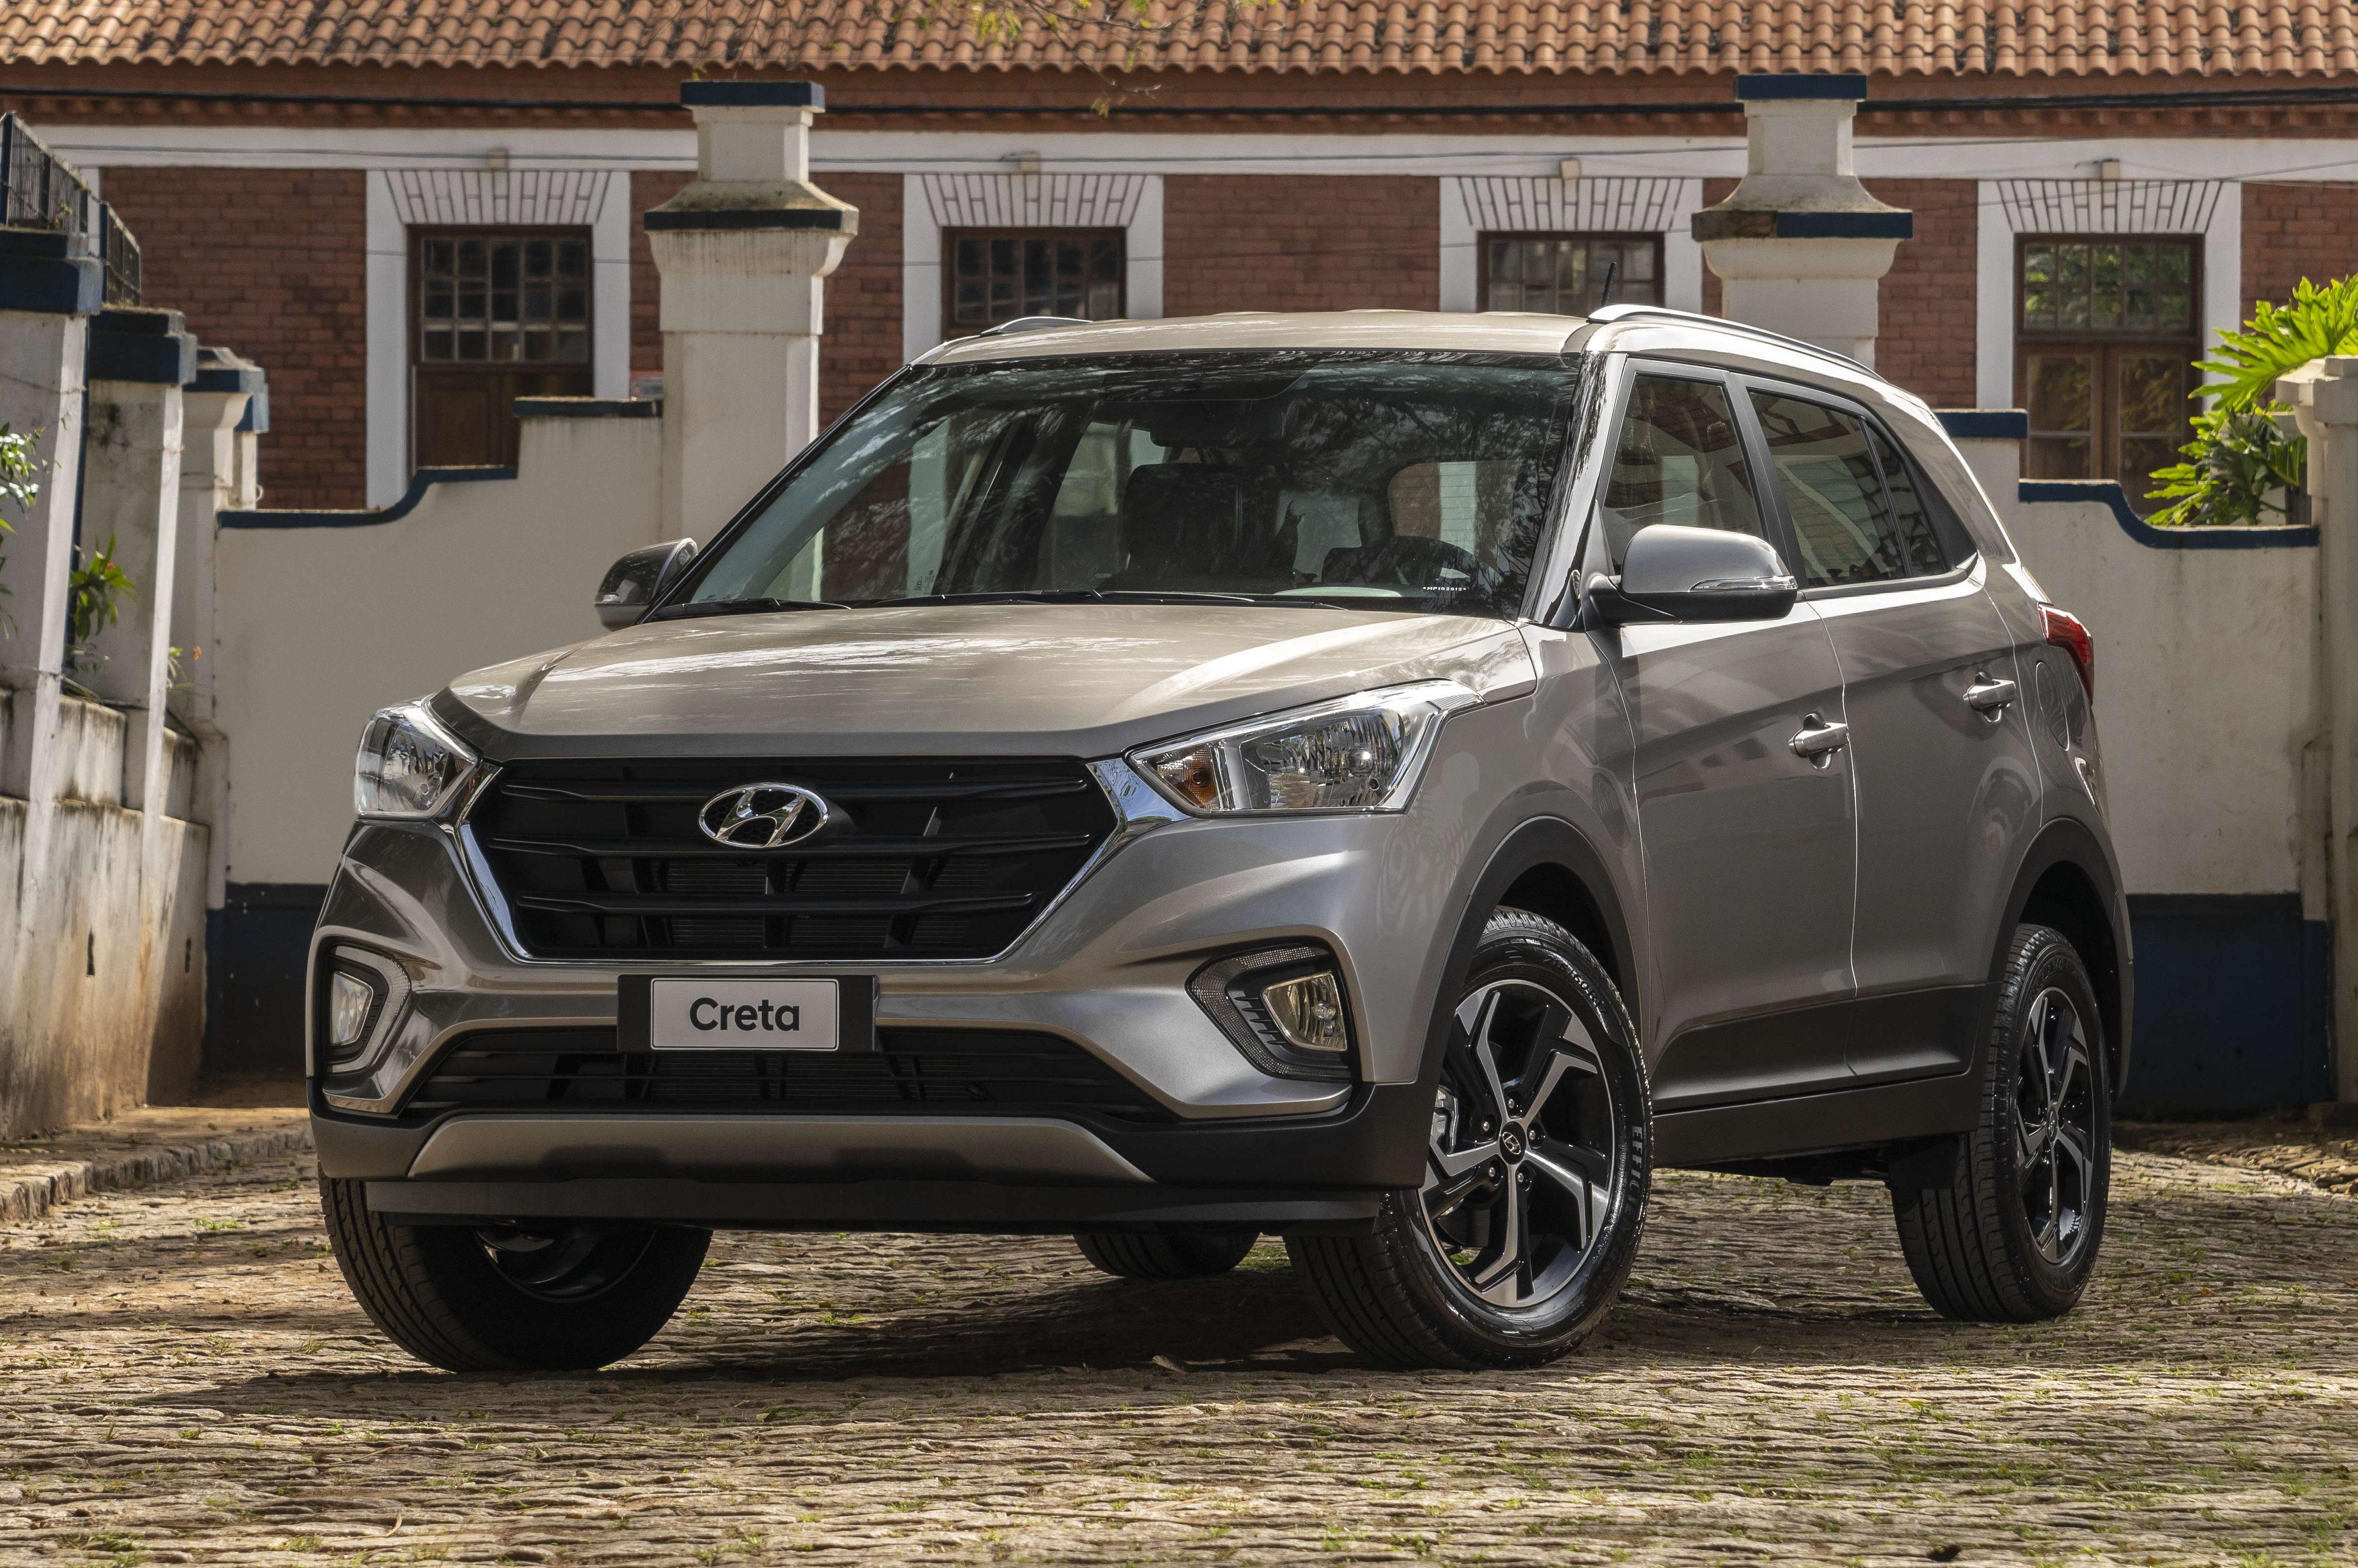 Hyundai-Creta-Smart-Plus-1.6-AT_2-e1597249515708.jpg